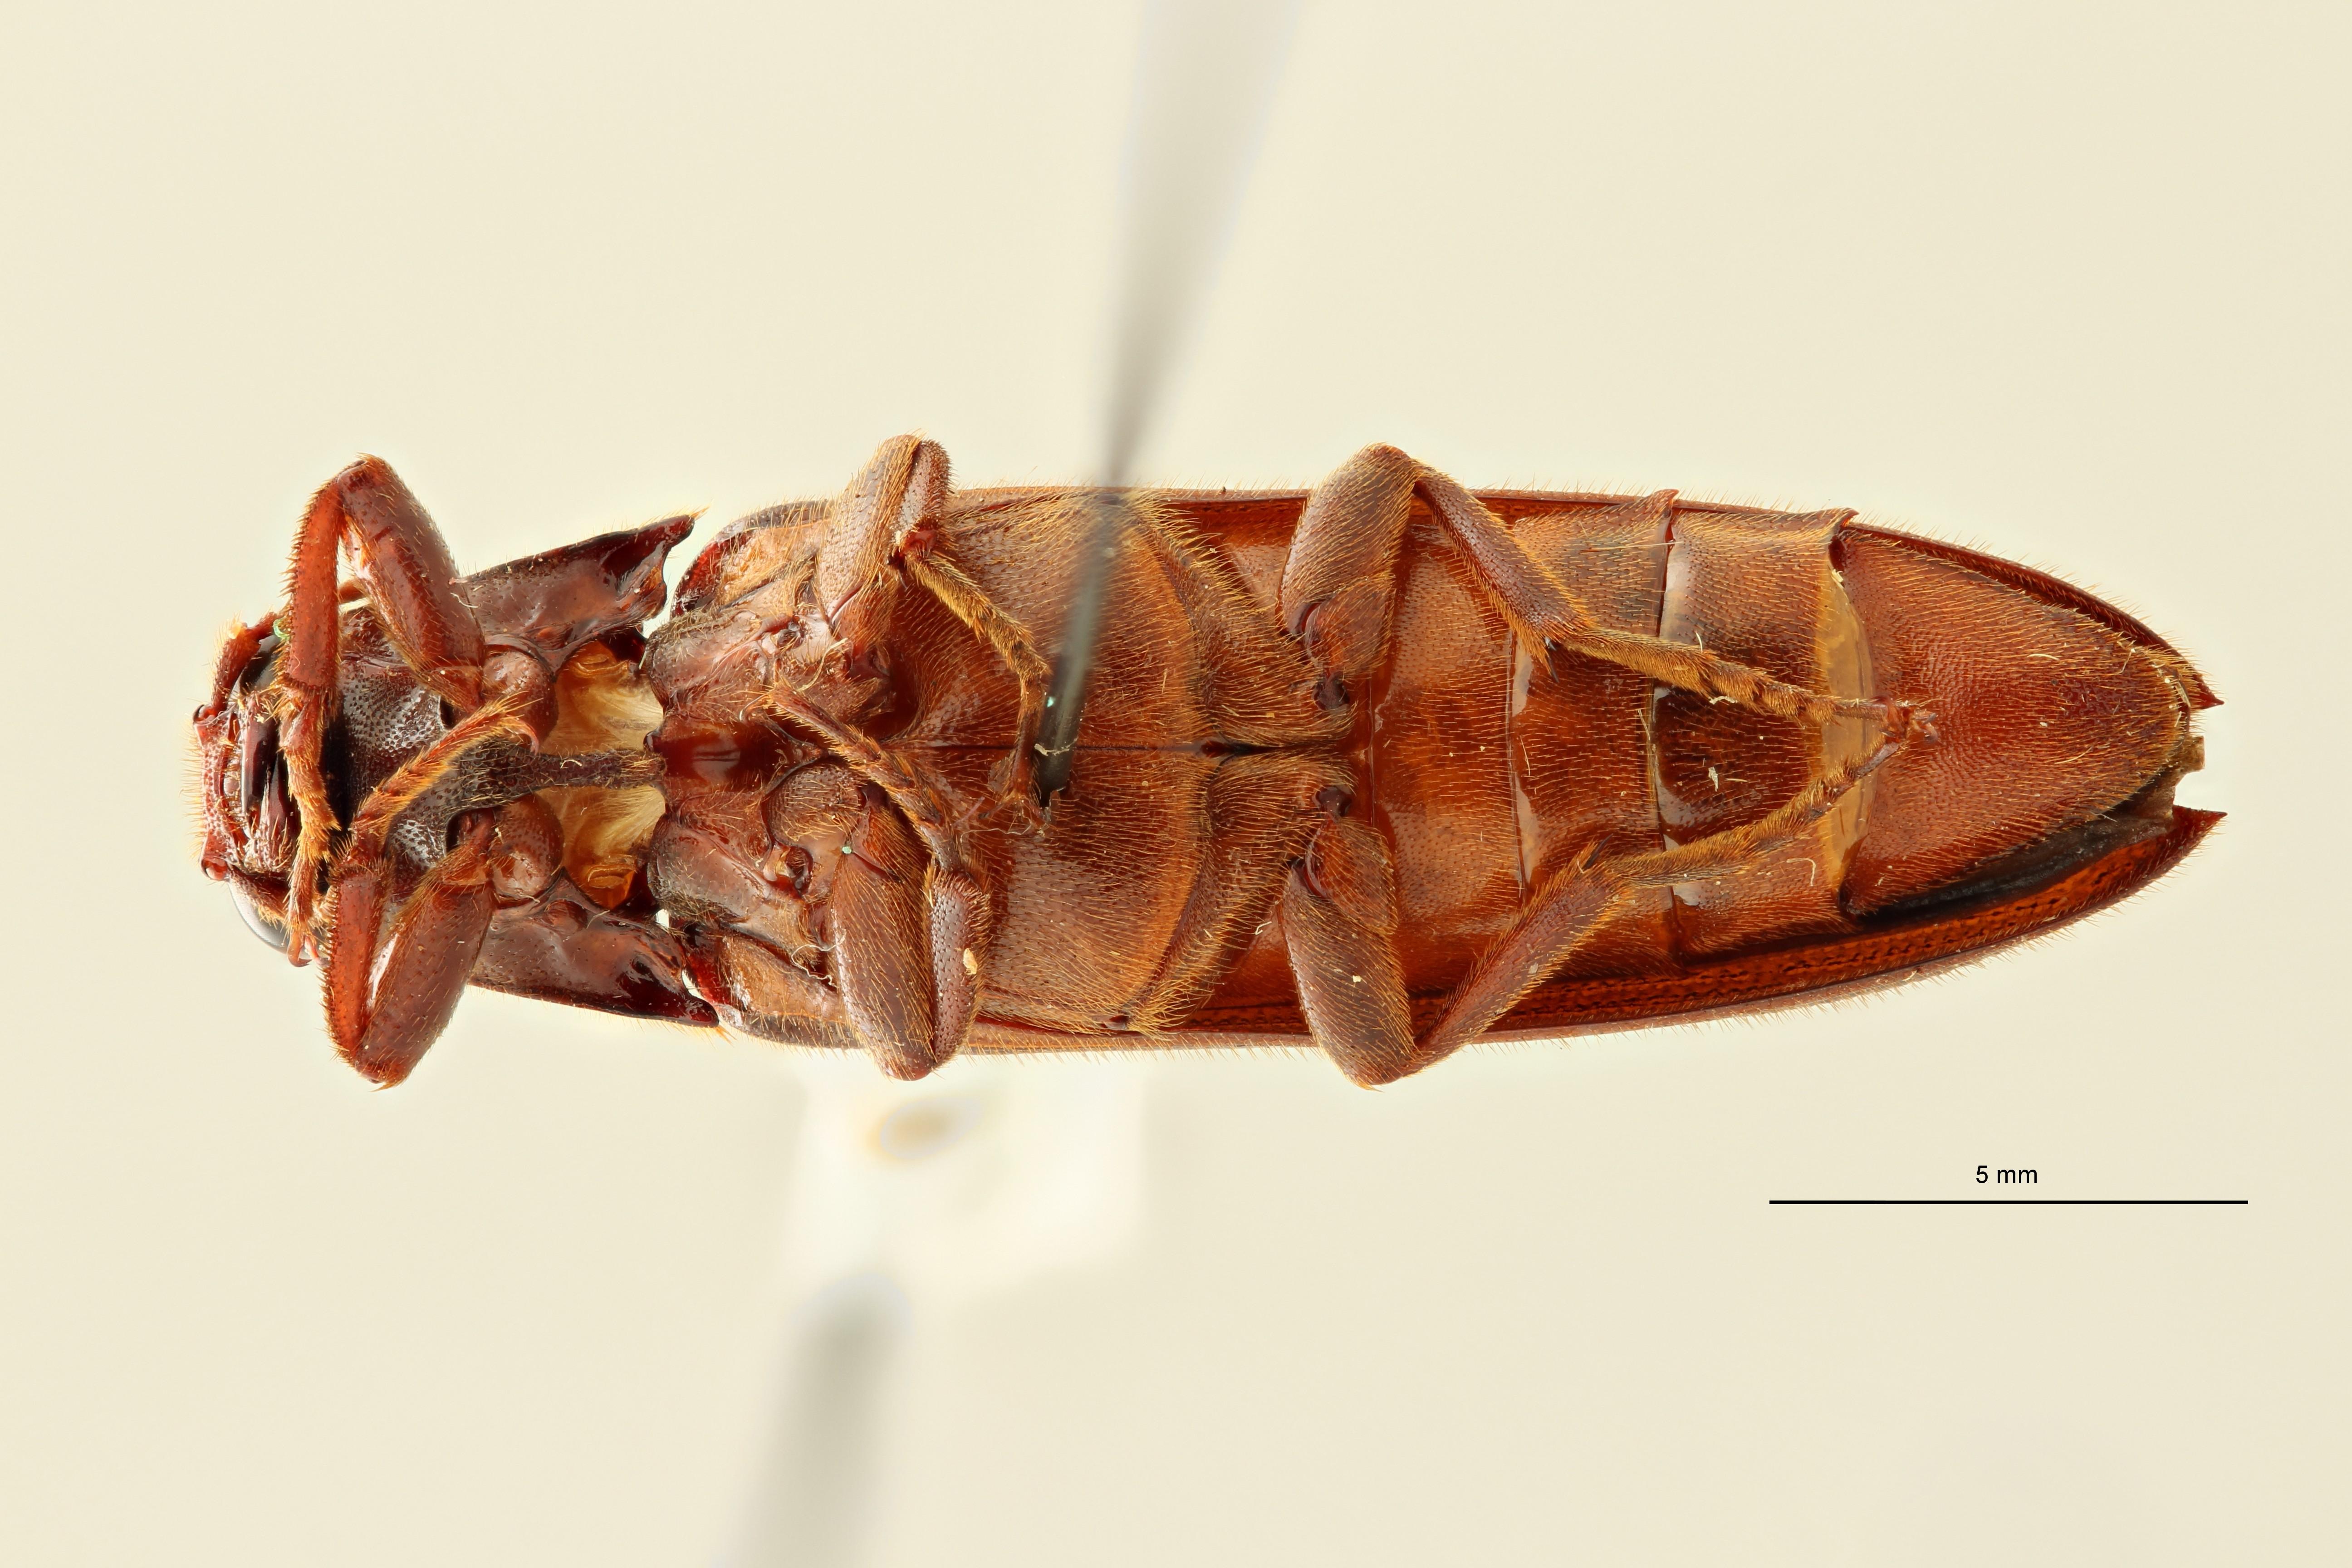 Eudicronychus distinctus var. fuscatus pt4 V ZS PMax Scaled.jpeg